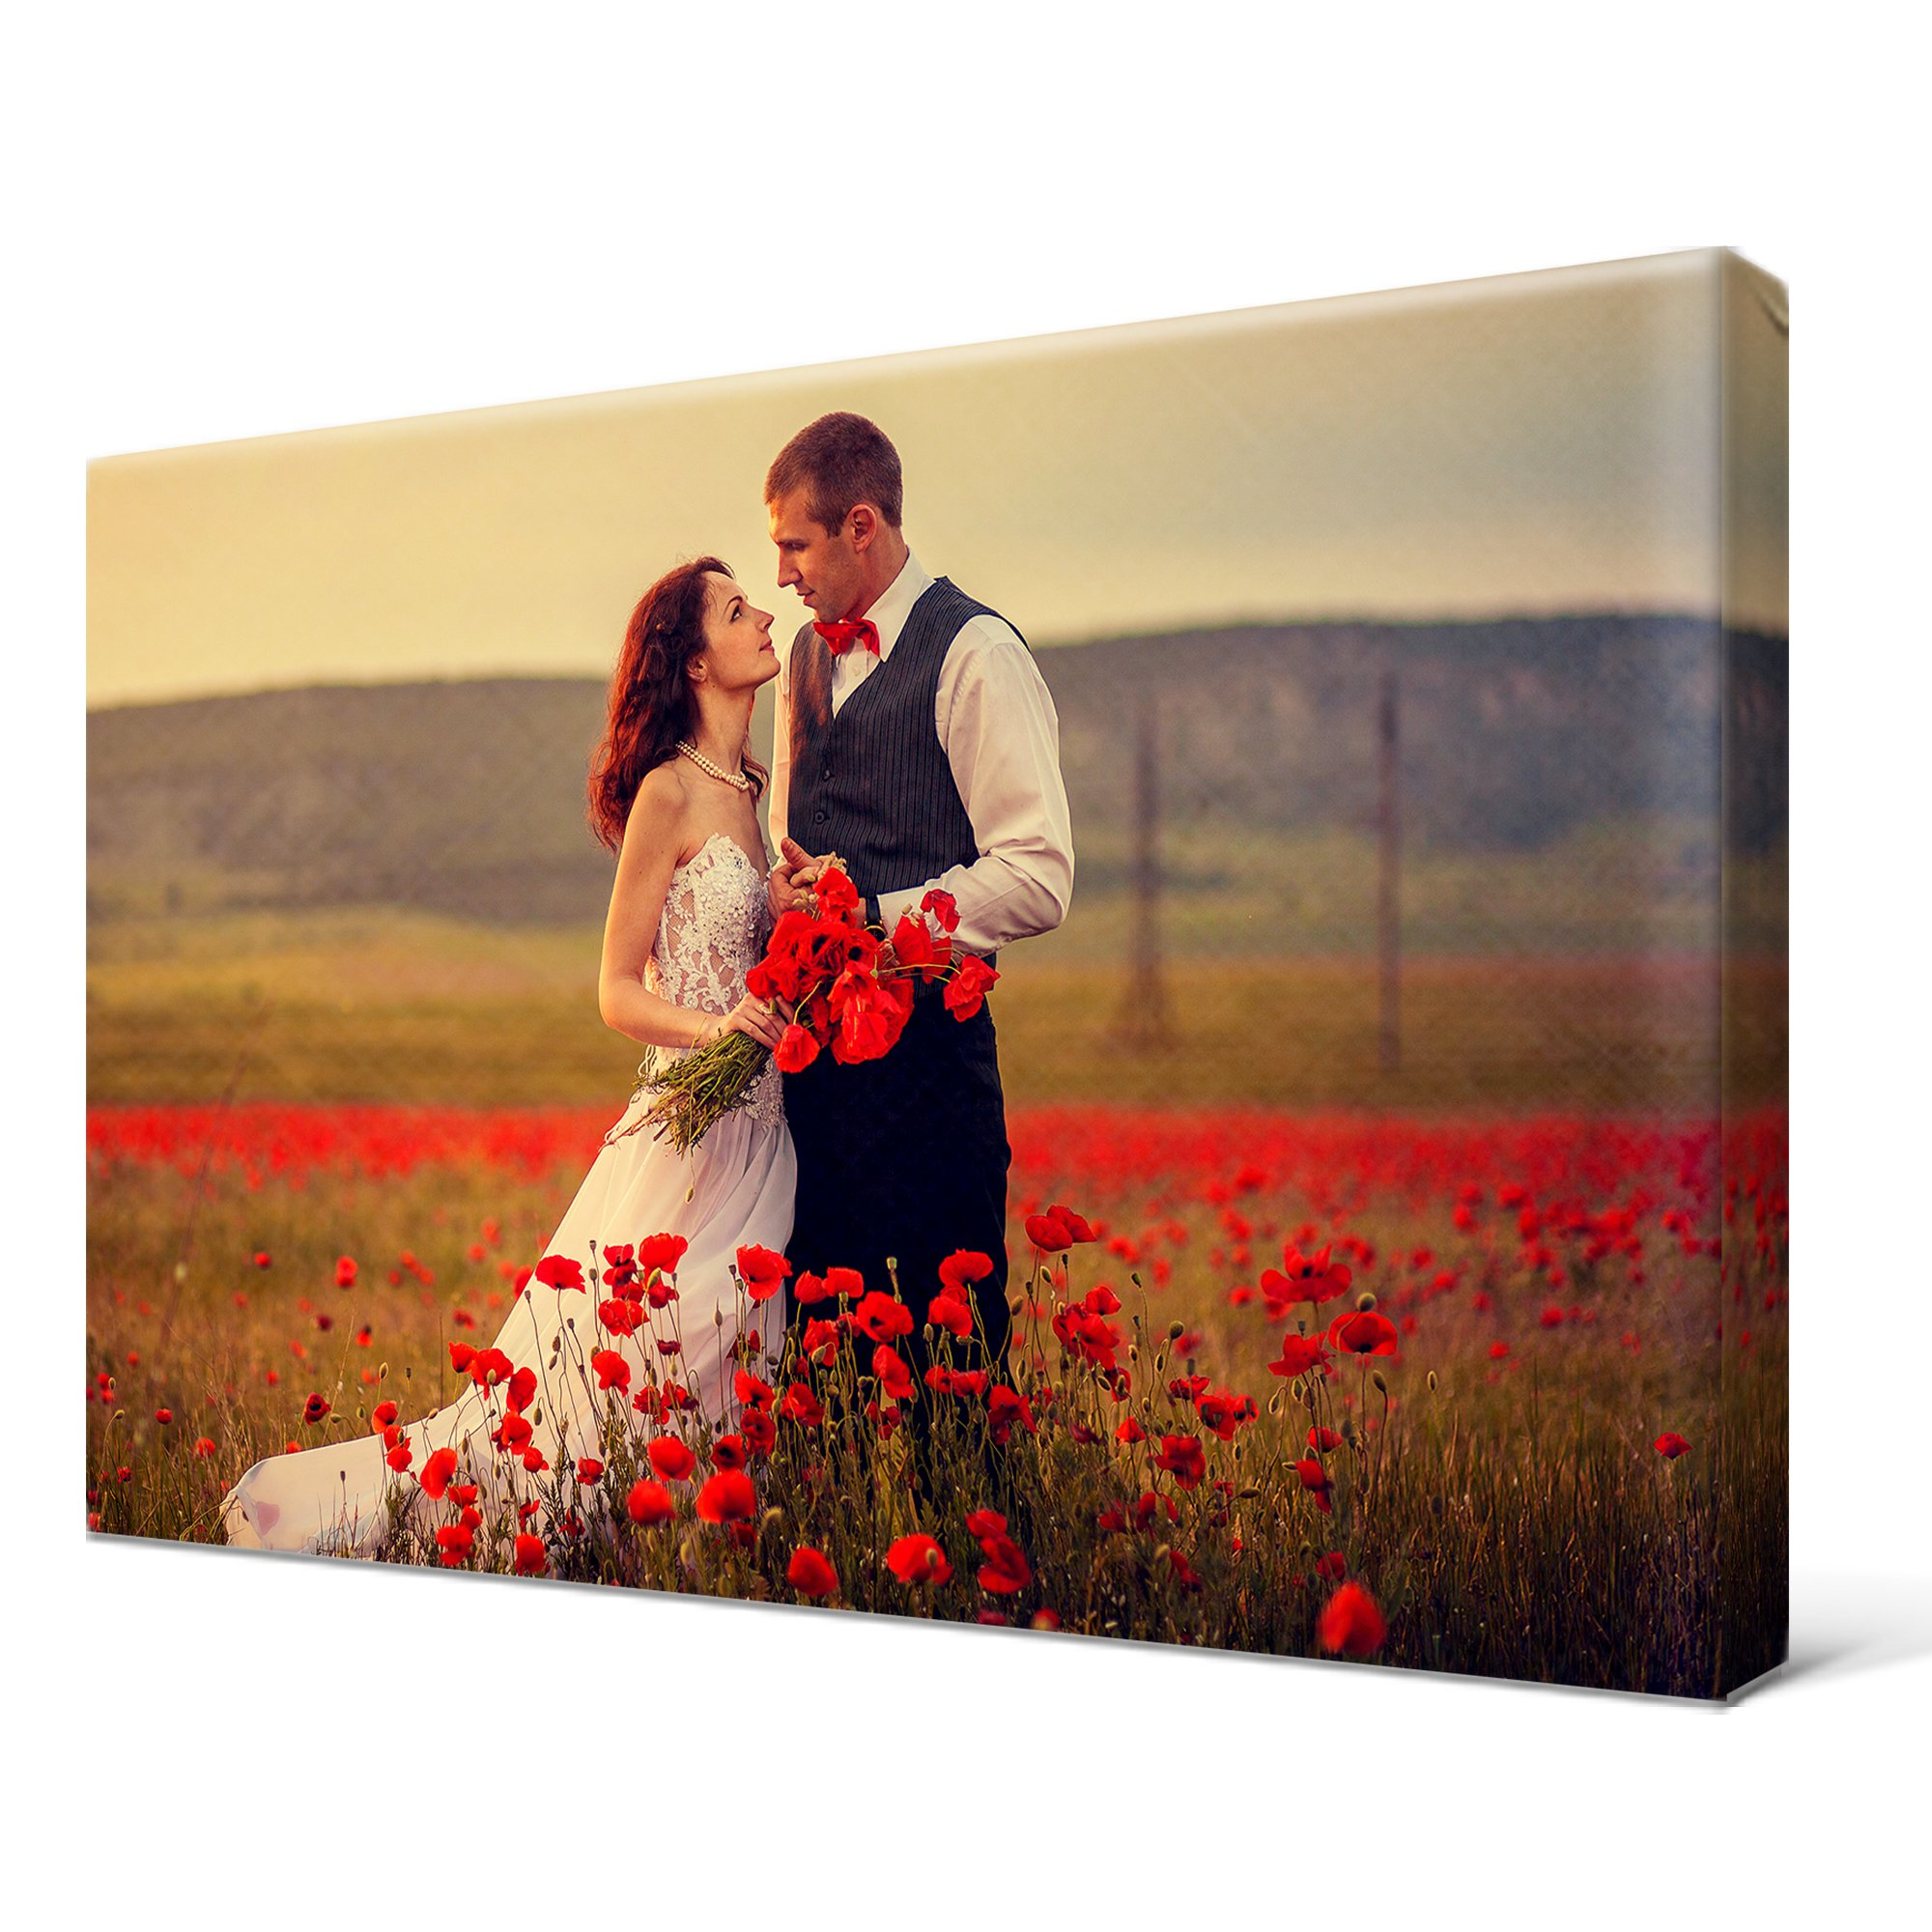 Фото-Картина на холсте Ваши фотографию 40x30cm изображения